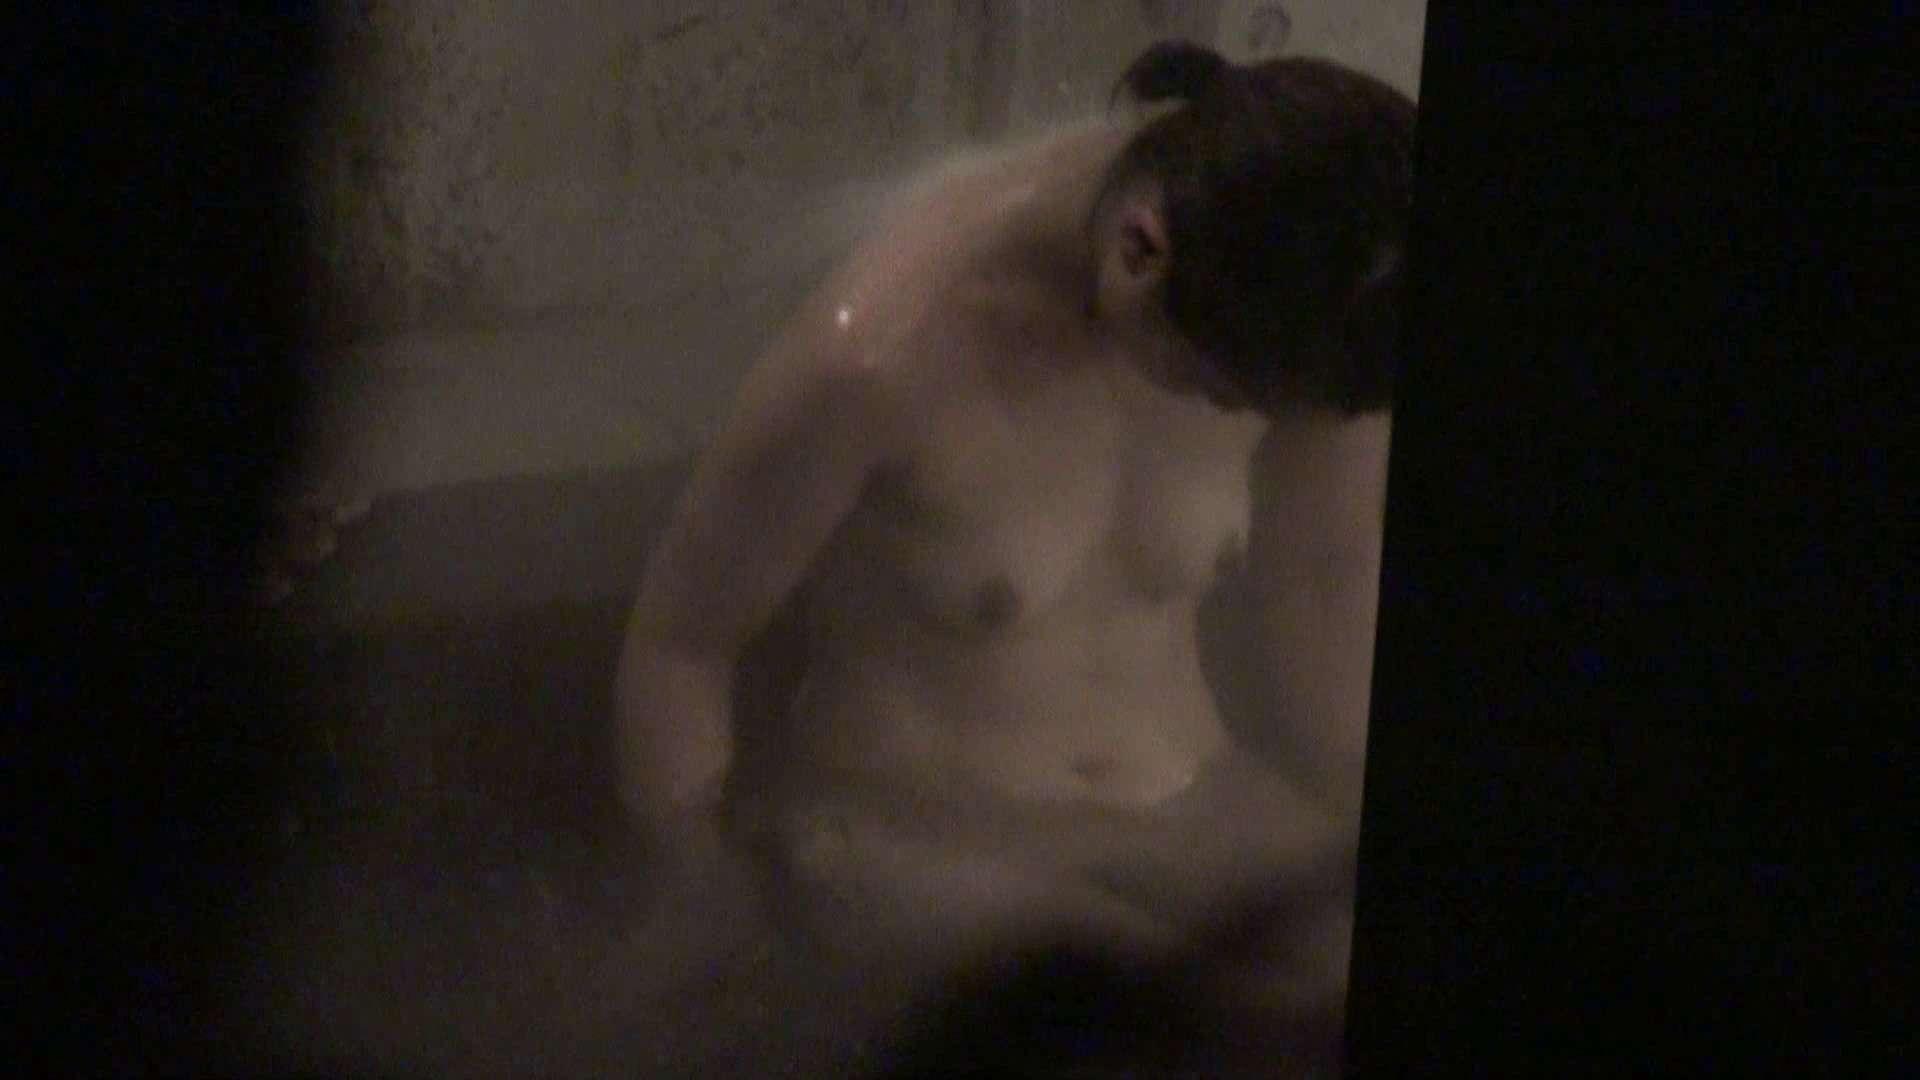 Aquaな露天風呂Vol.426 美しいOLの裸体 AV無料動画キャプチャ 70pic 44